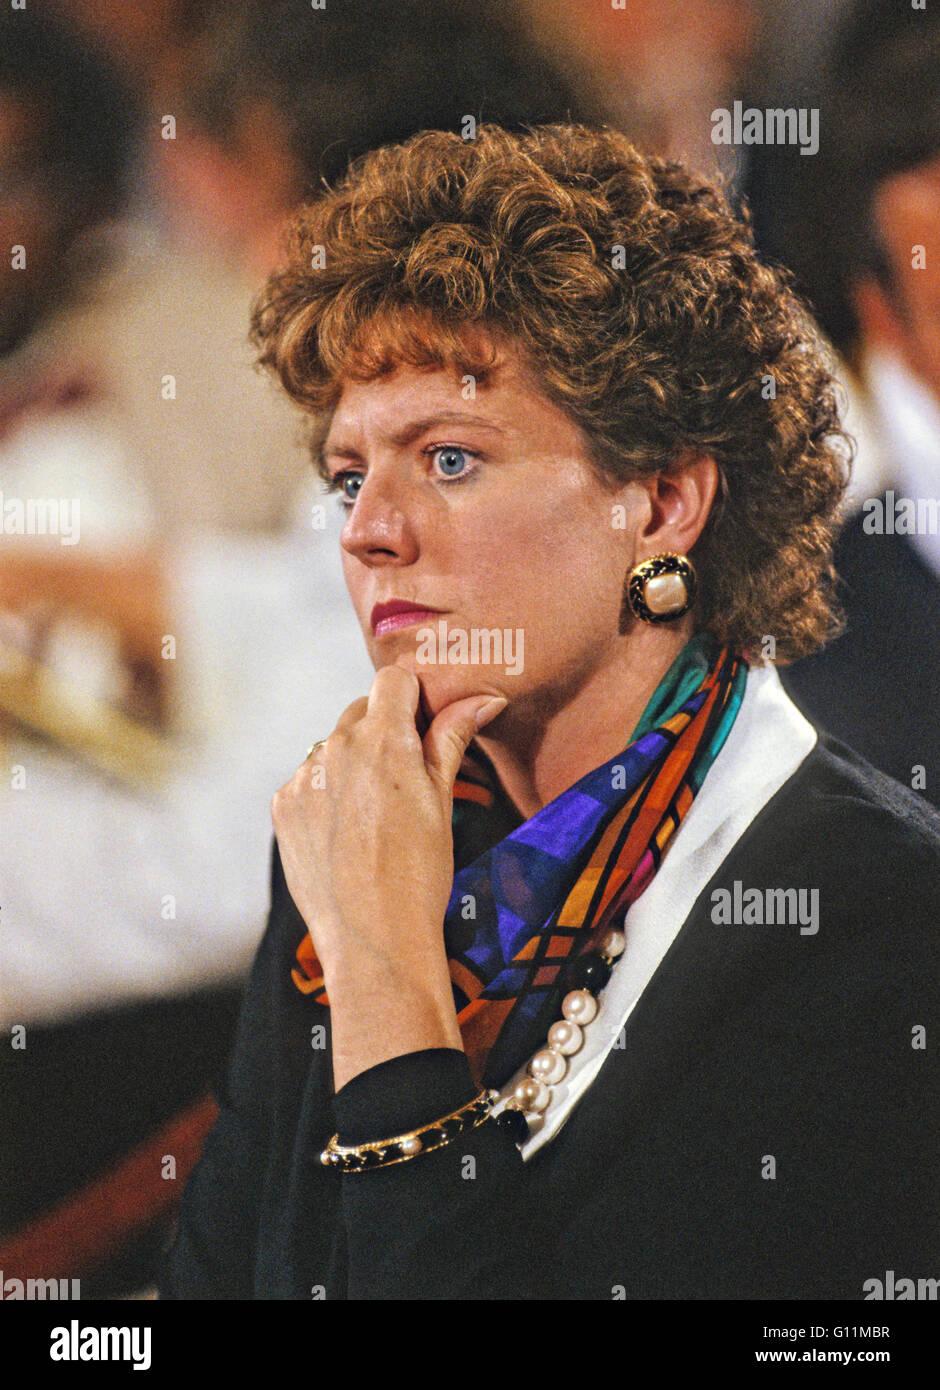 Washington, District of Columbia, USA. 11th Sep, 1991. Virginia Thomas watches the hearing before the US Senate - Stock Image